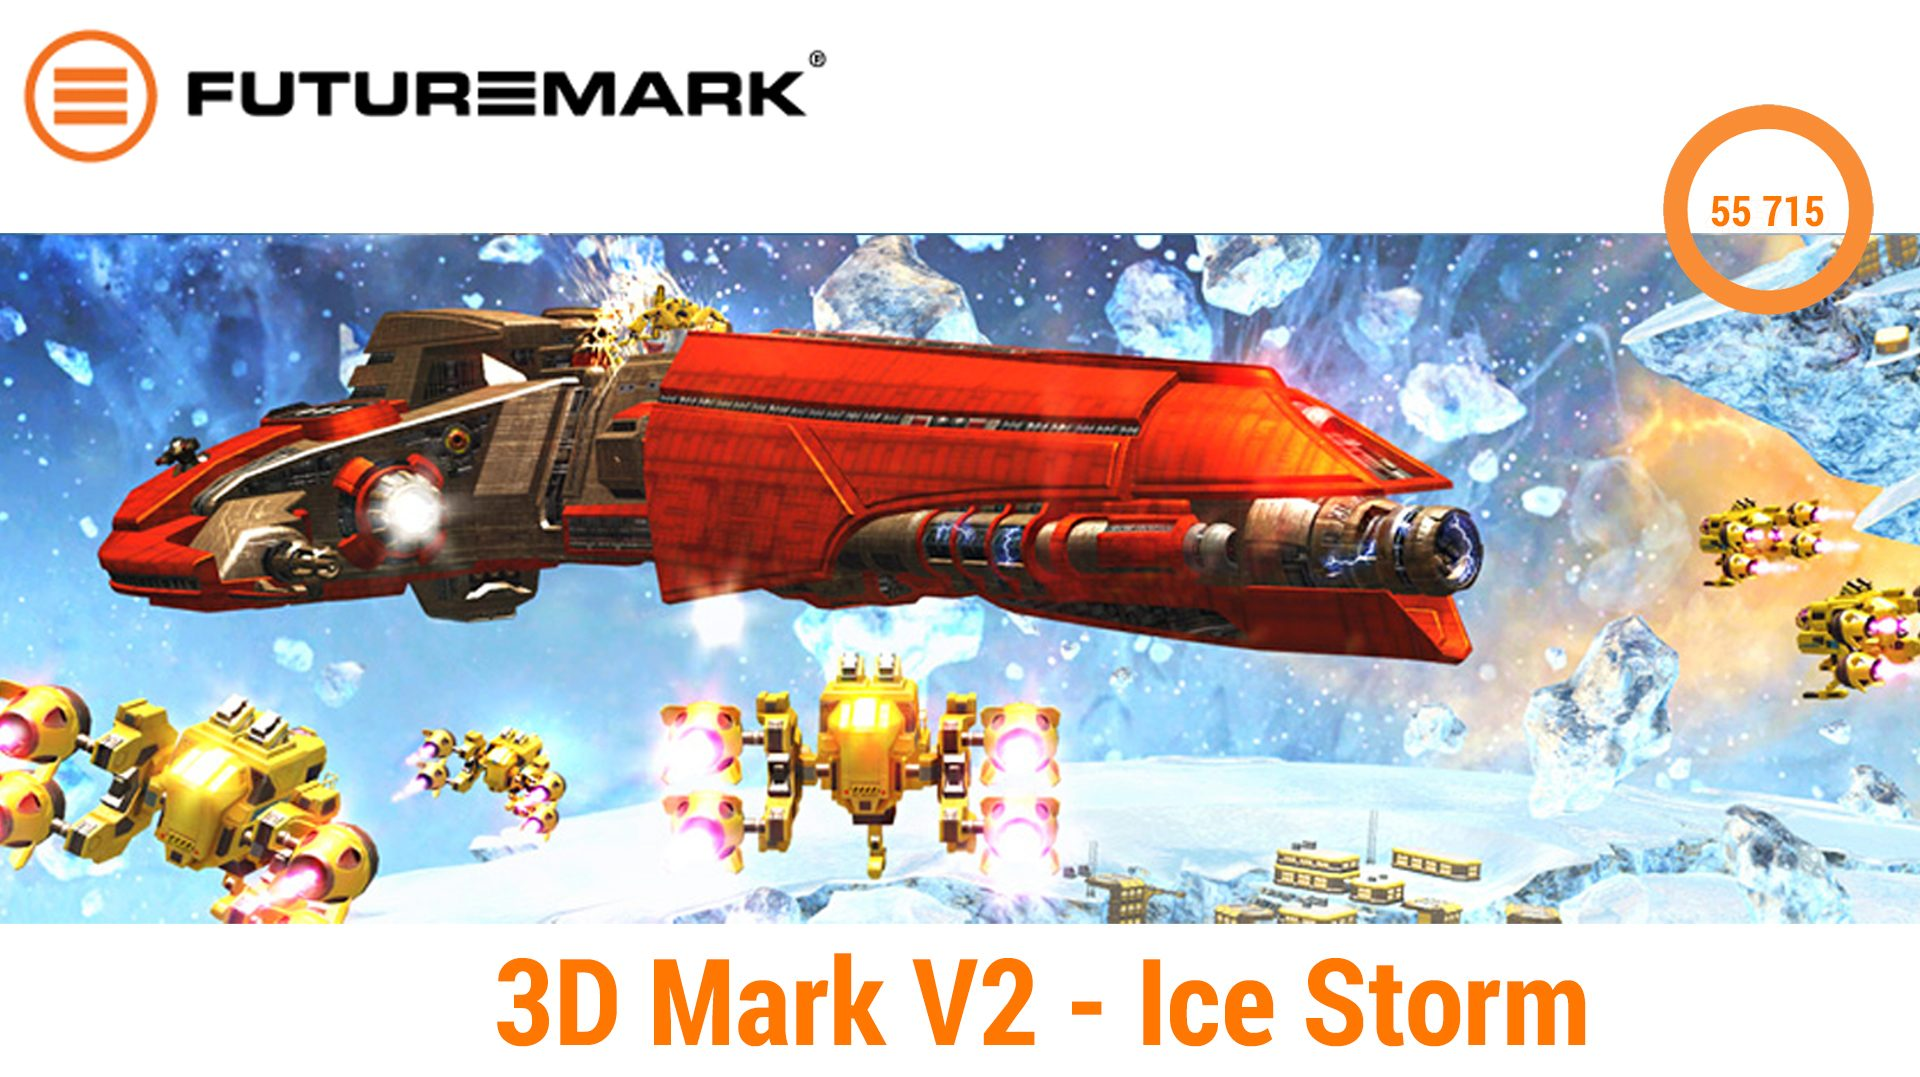 HP-Spectre-x360-15-ap006ng-3D-Mark-V2—Ice-Storm-2